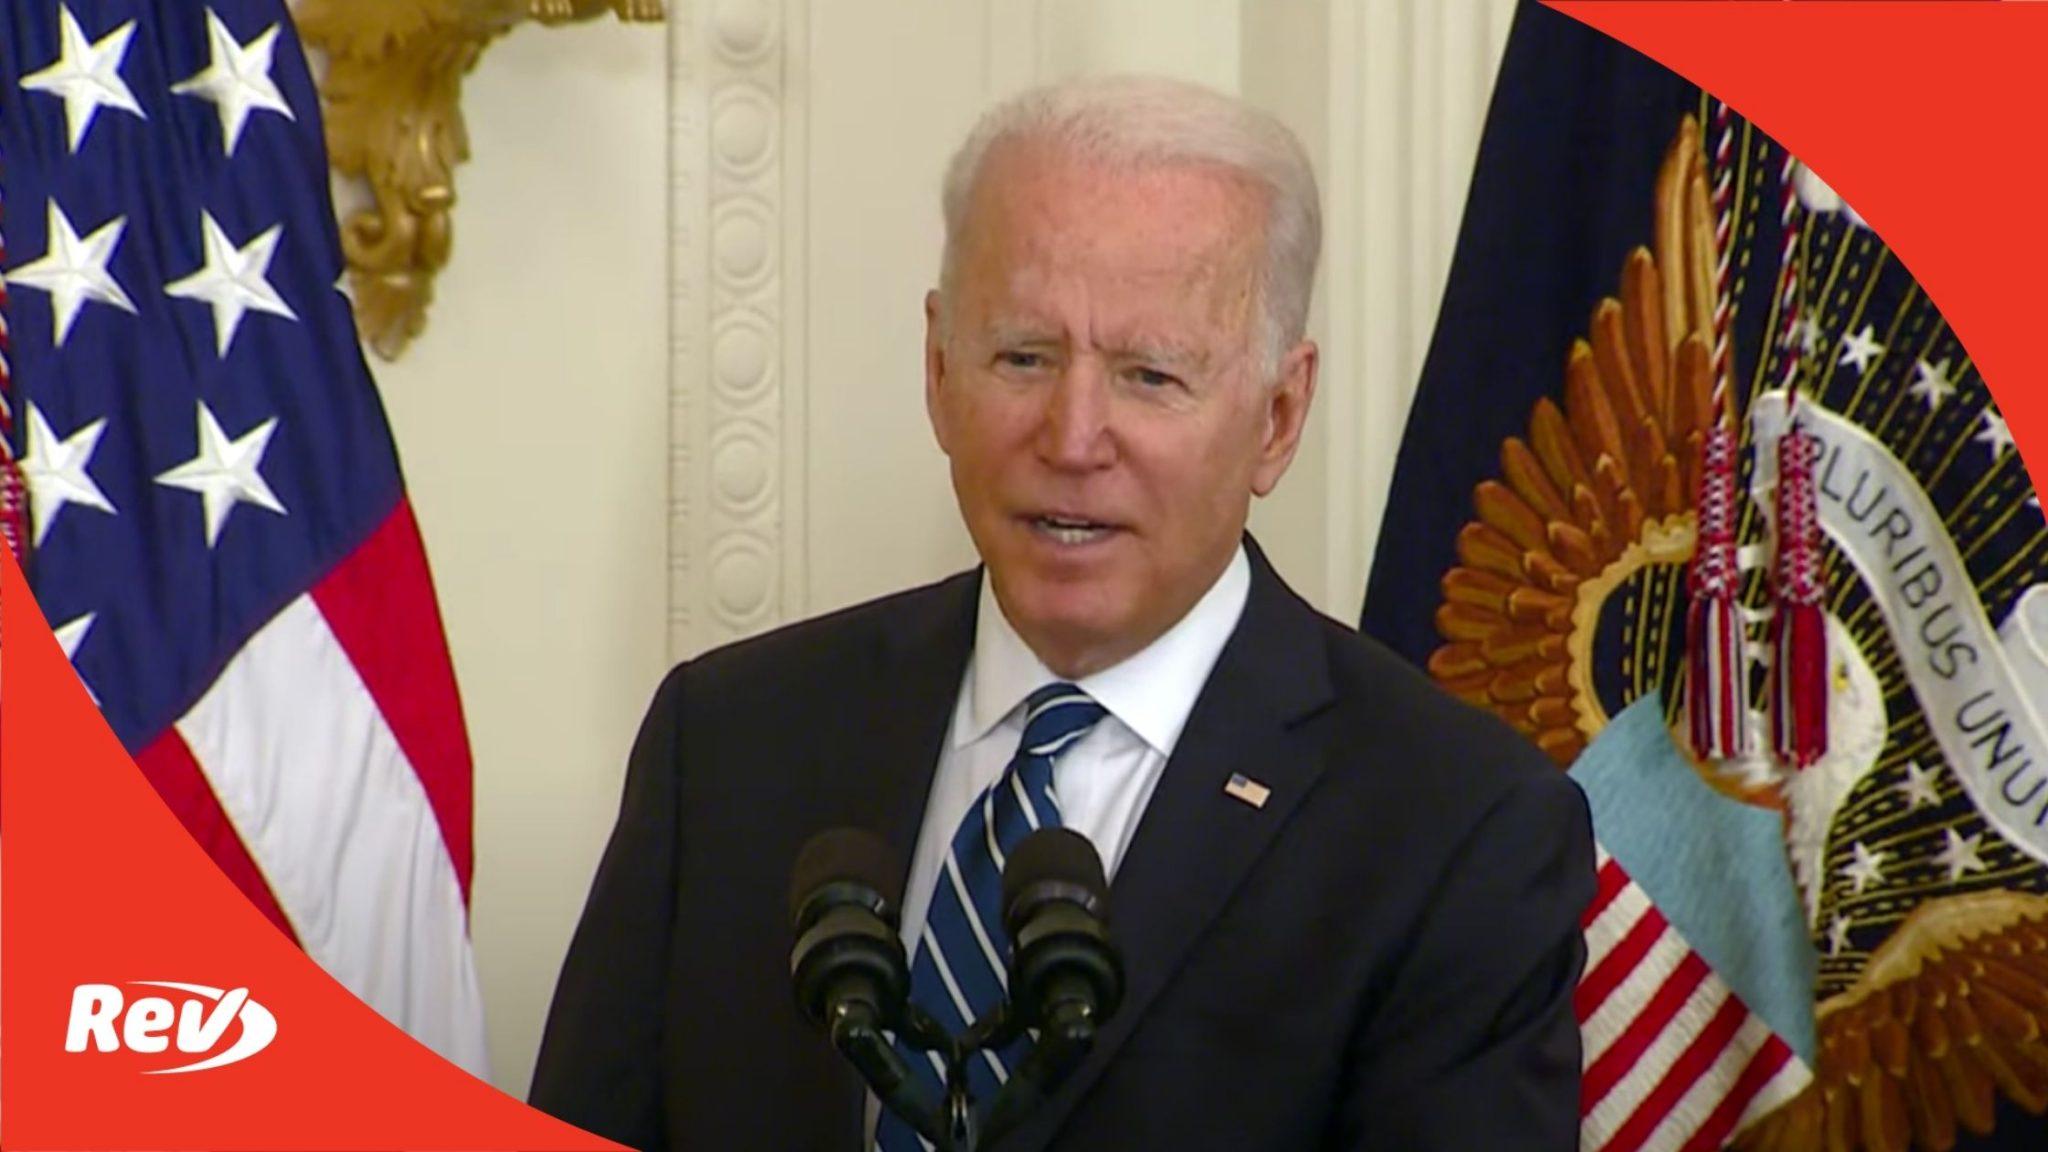 Joe Biden Naturalization Ceremony Speech Transcript July 2